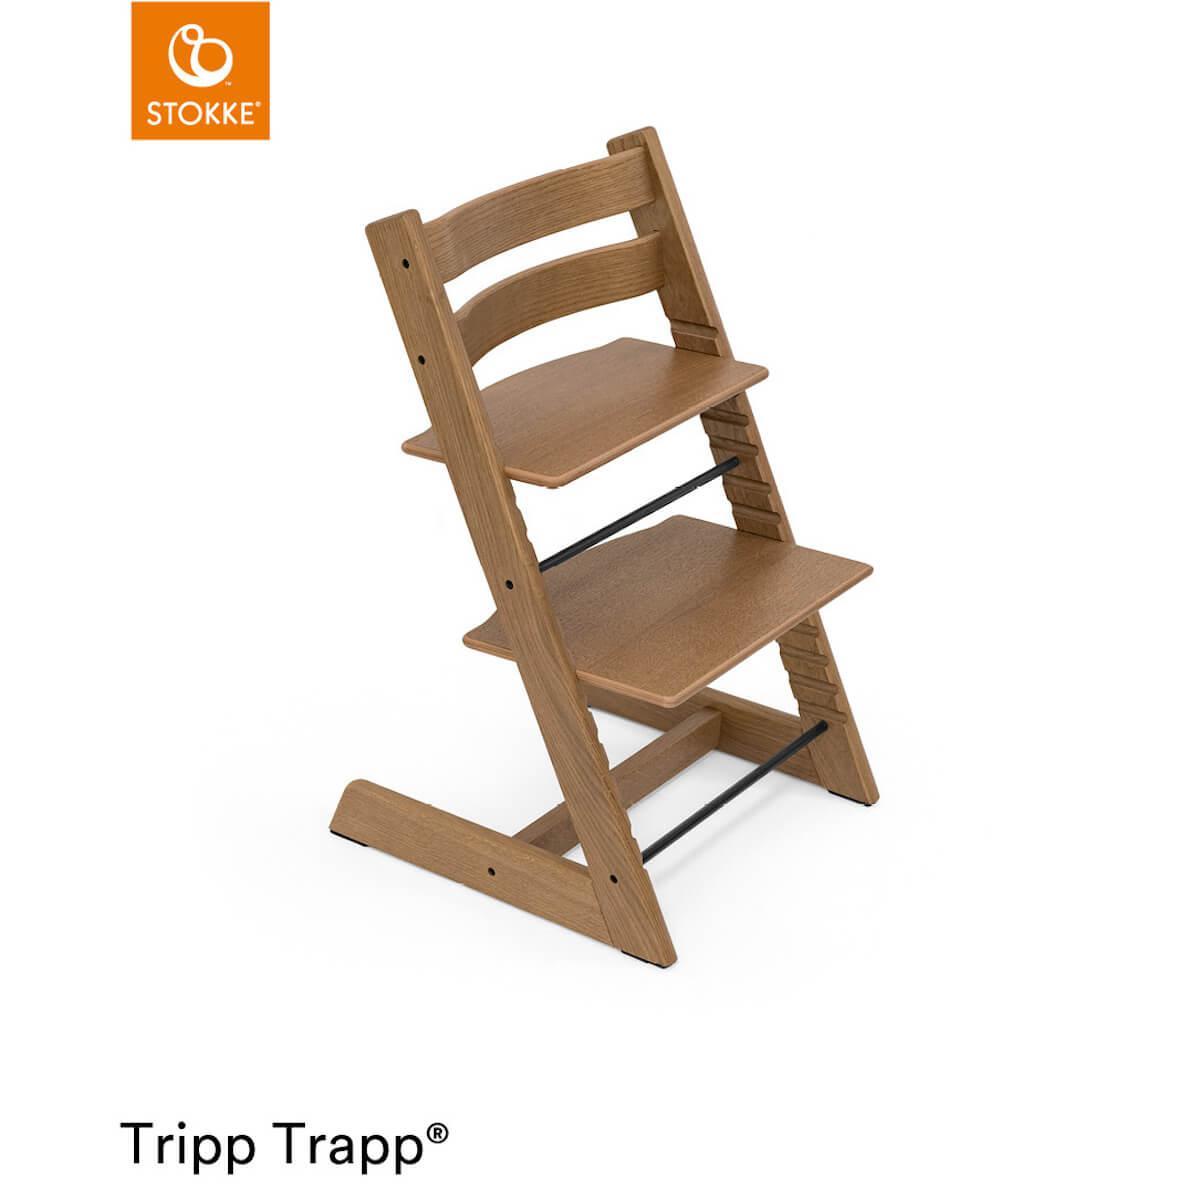 Trona bebé TRIPP TRAPP Stokke roble marrón